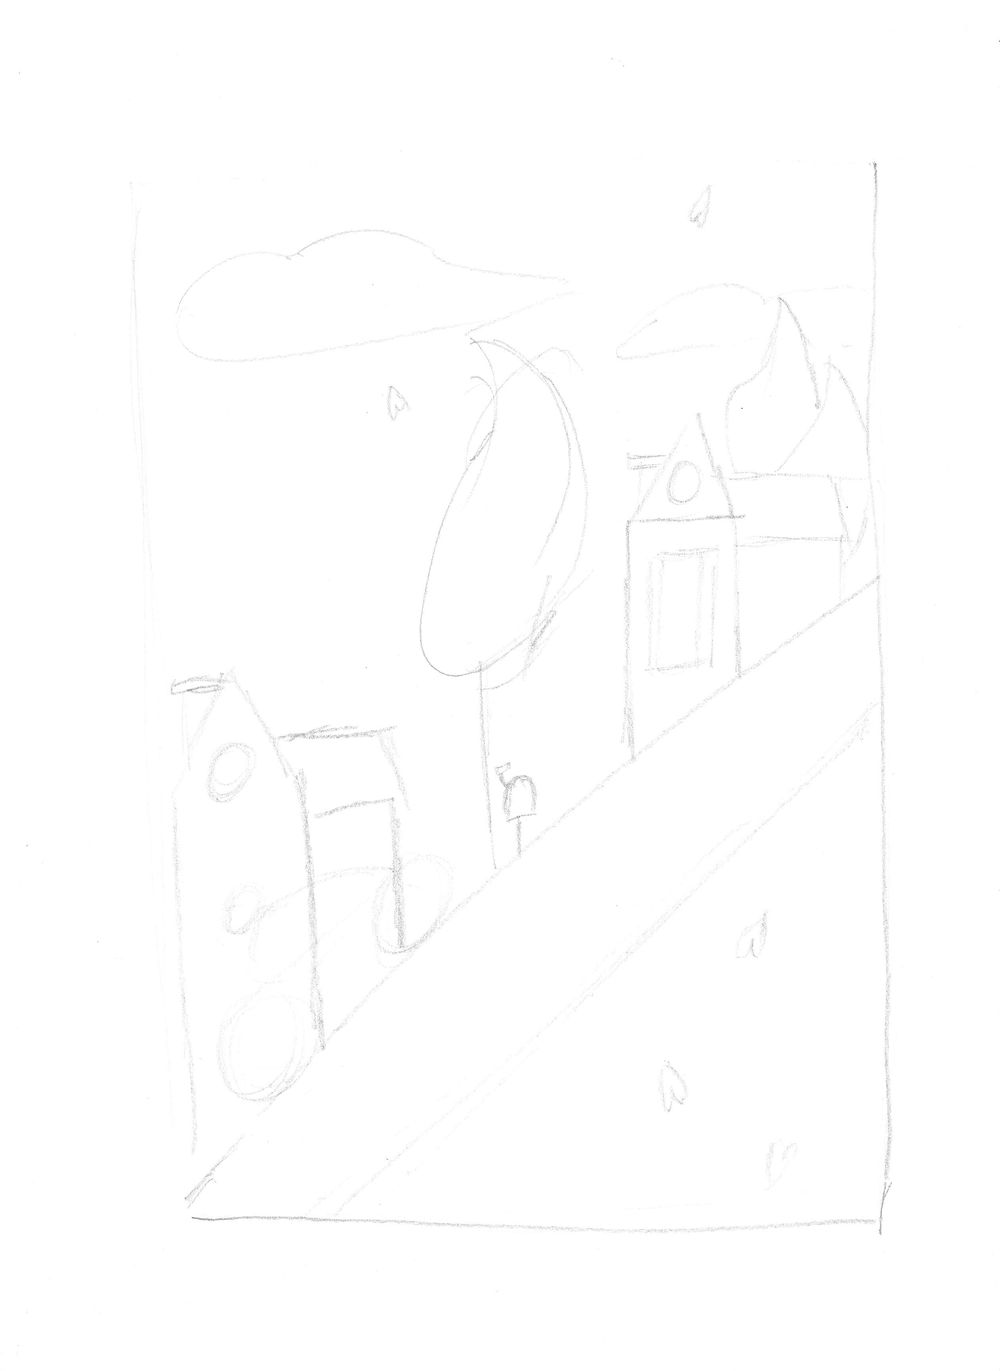 Slope Illustration - image 1 - student project